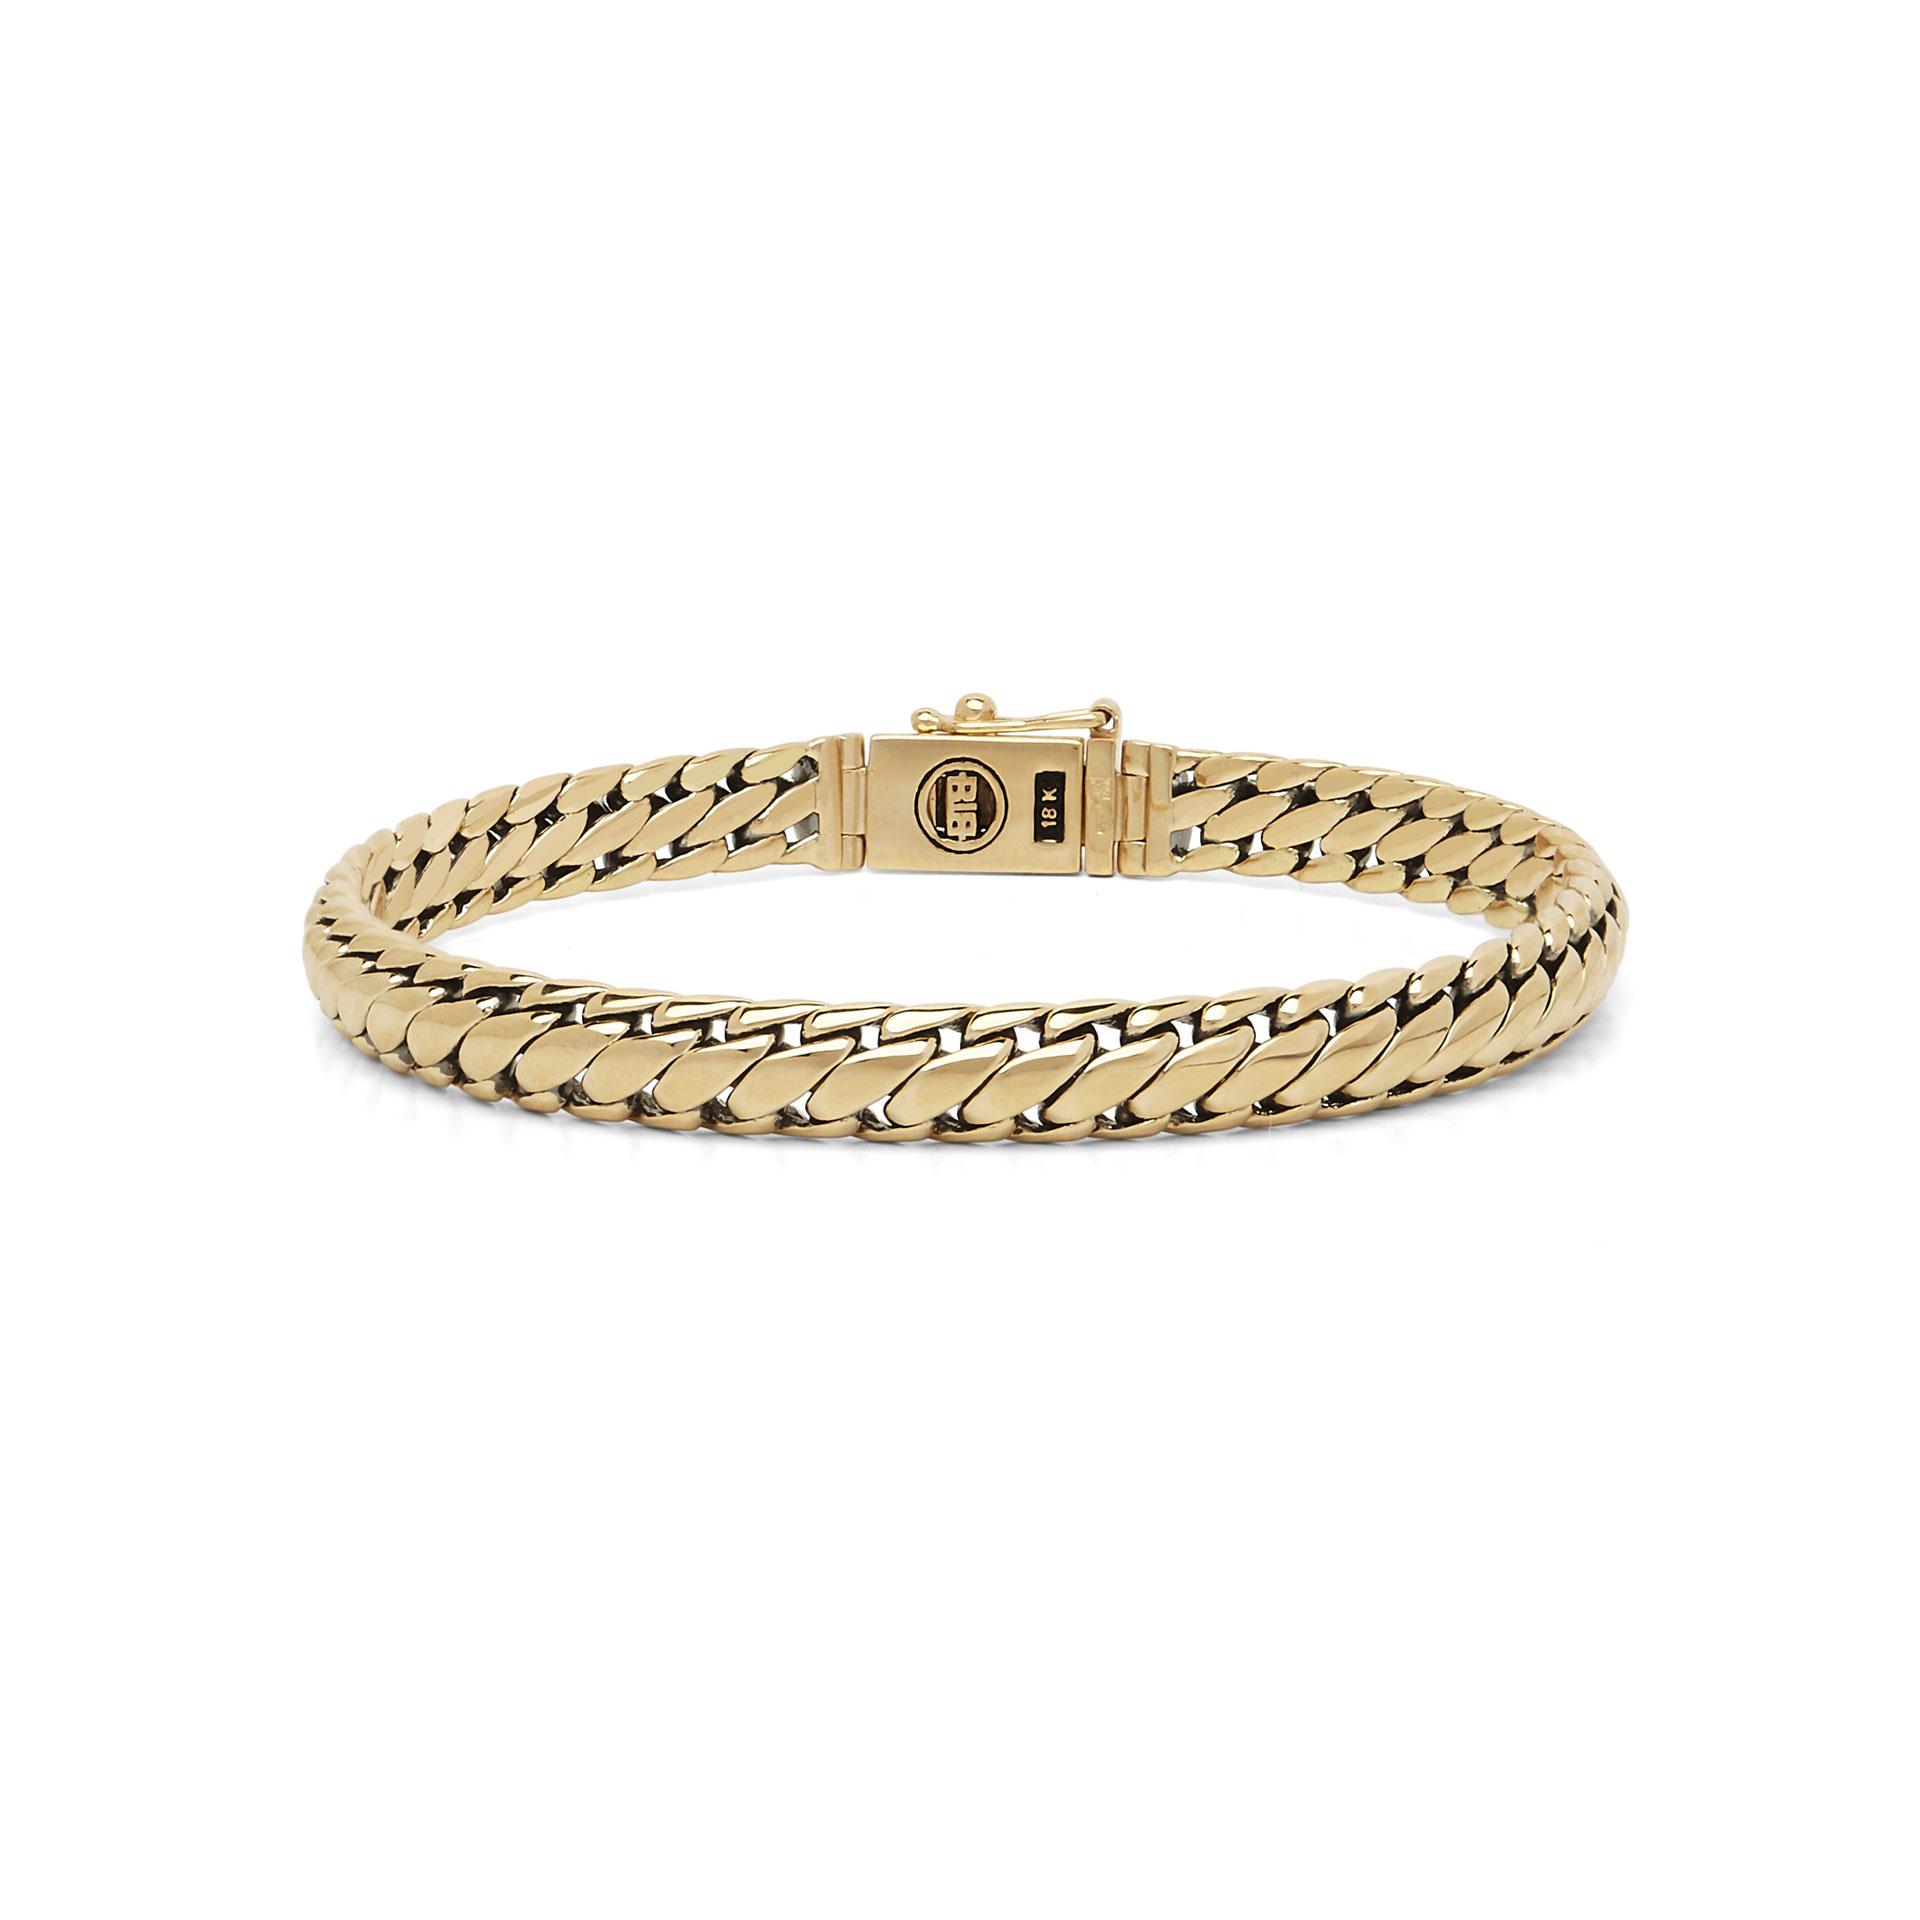 Ben bracelet Yellow gold-3